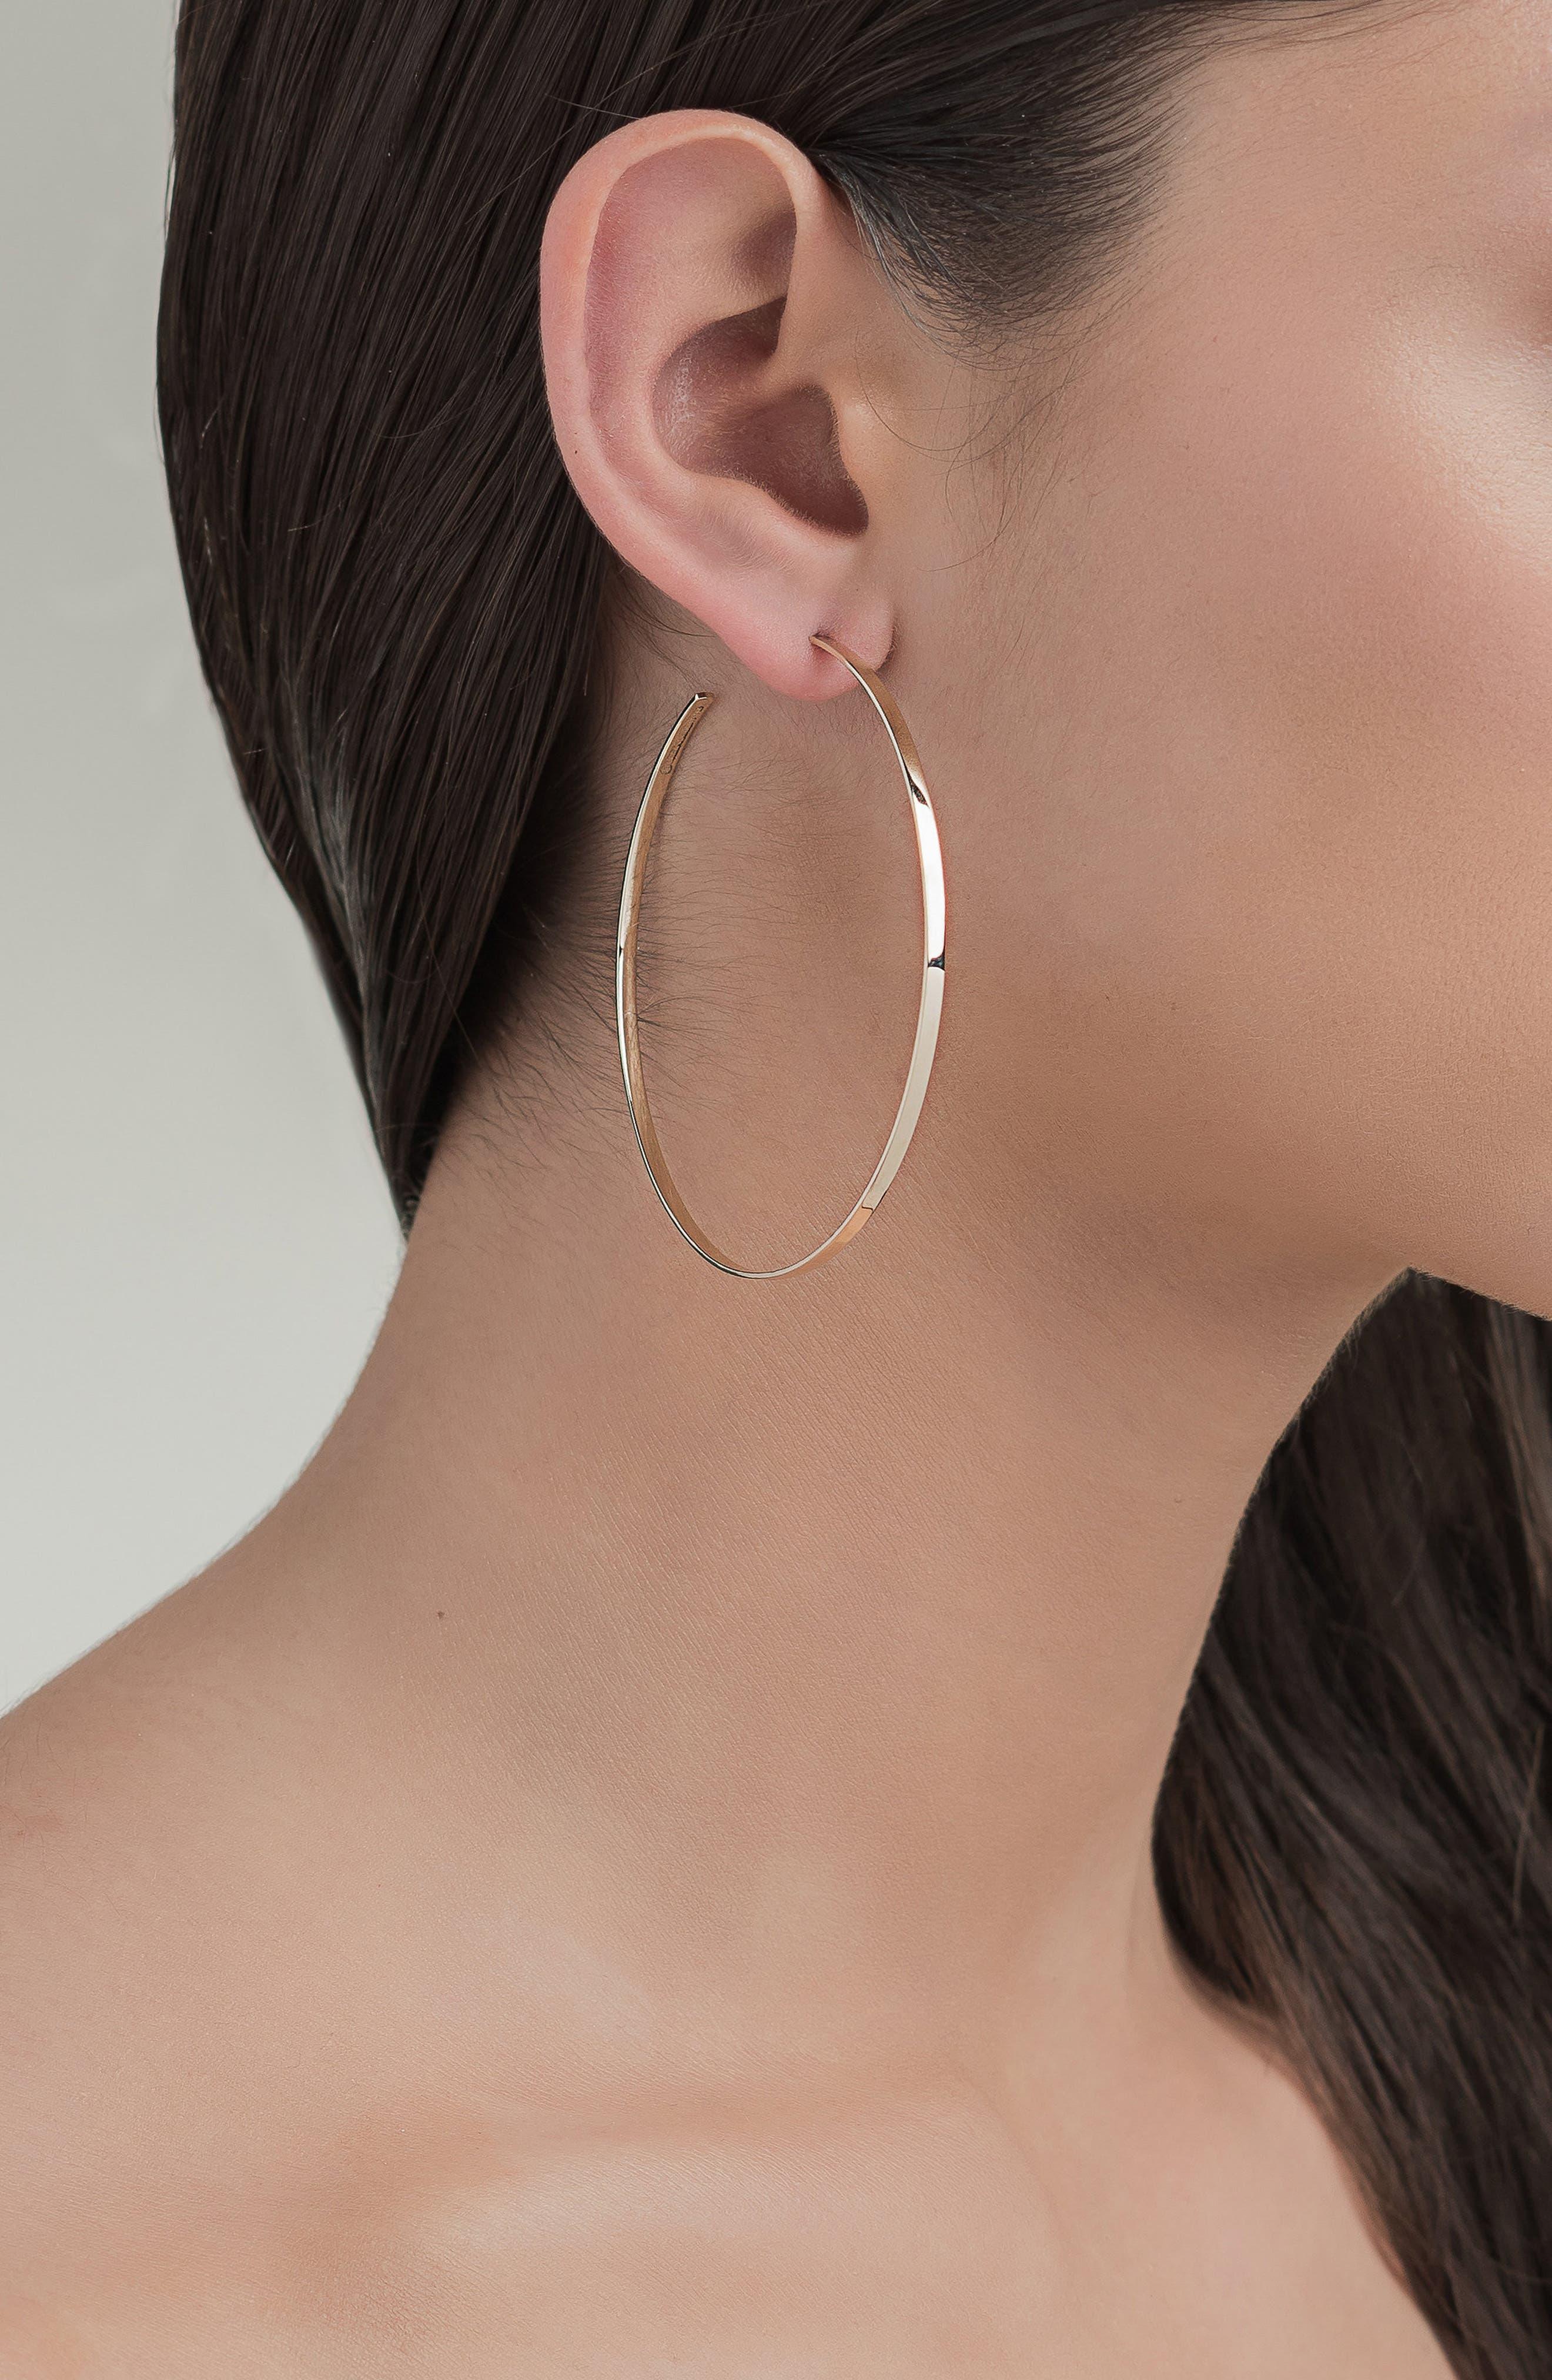 LANA JEWELRY,                             Sunrise Hoop Earrings,                             Alternate thumbnail 2, color,                             YELLOW GOLD